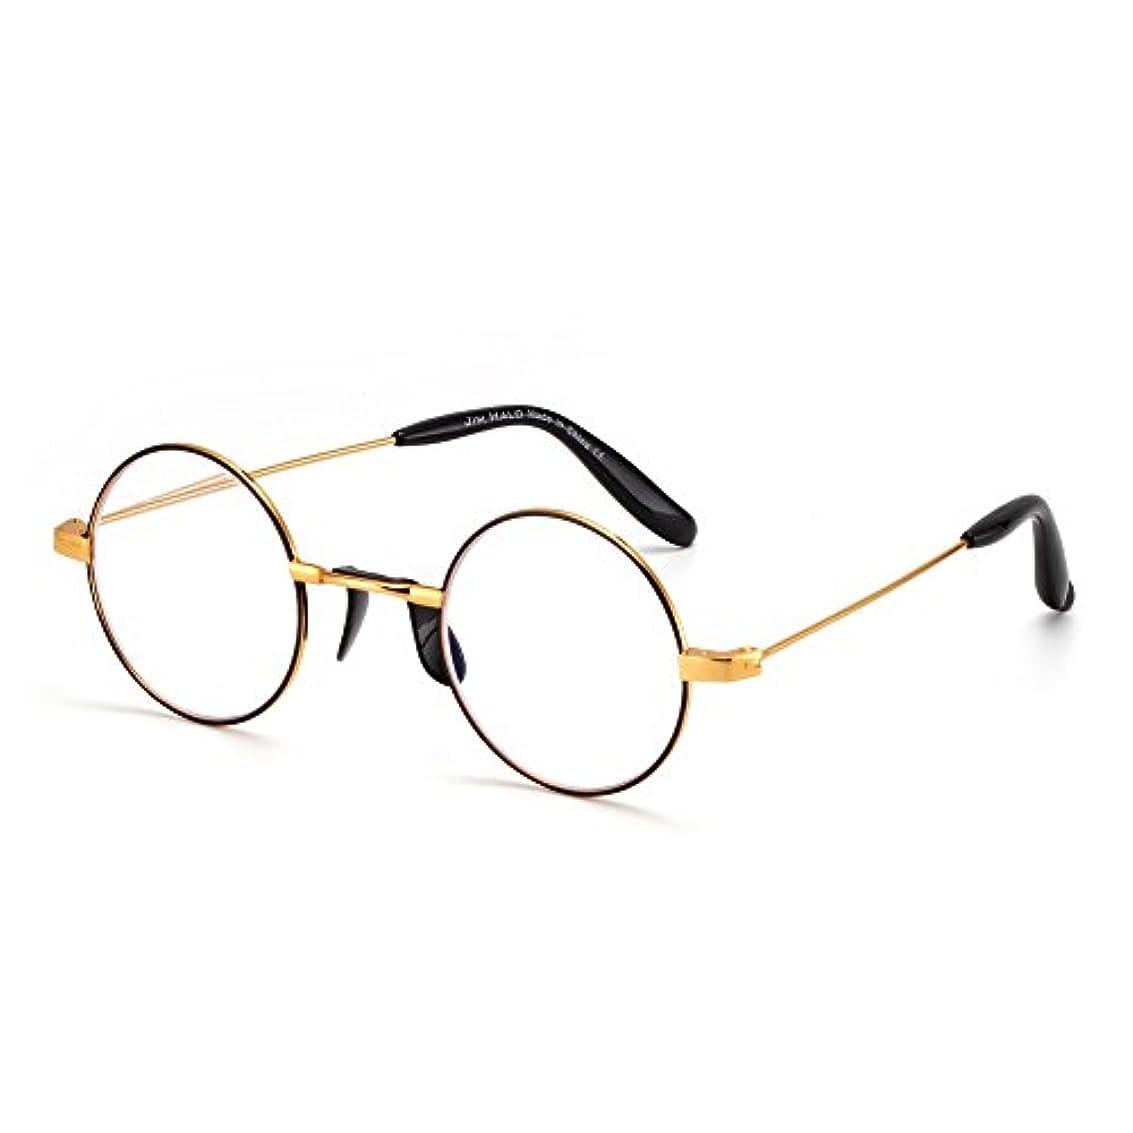 JIM HALO ラウンドリーディンググラス ブルーライトカット 老眼鏡 軽量 シニアグラス おしゃれ レディース メンズ(ブラック、+1.50)